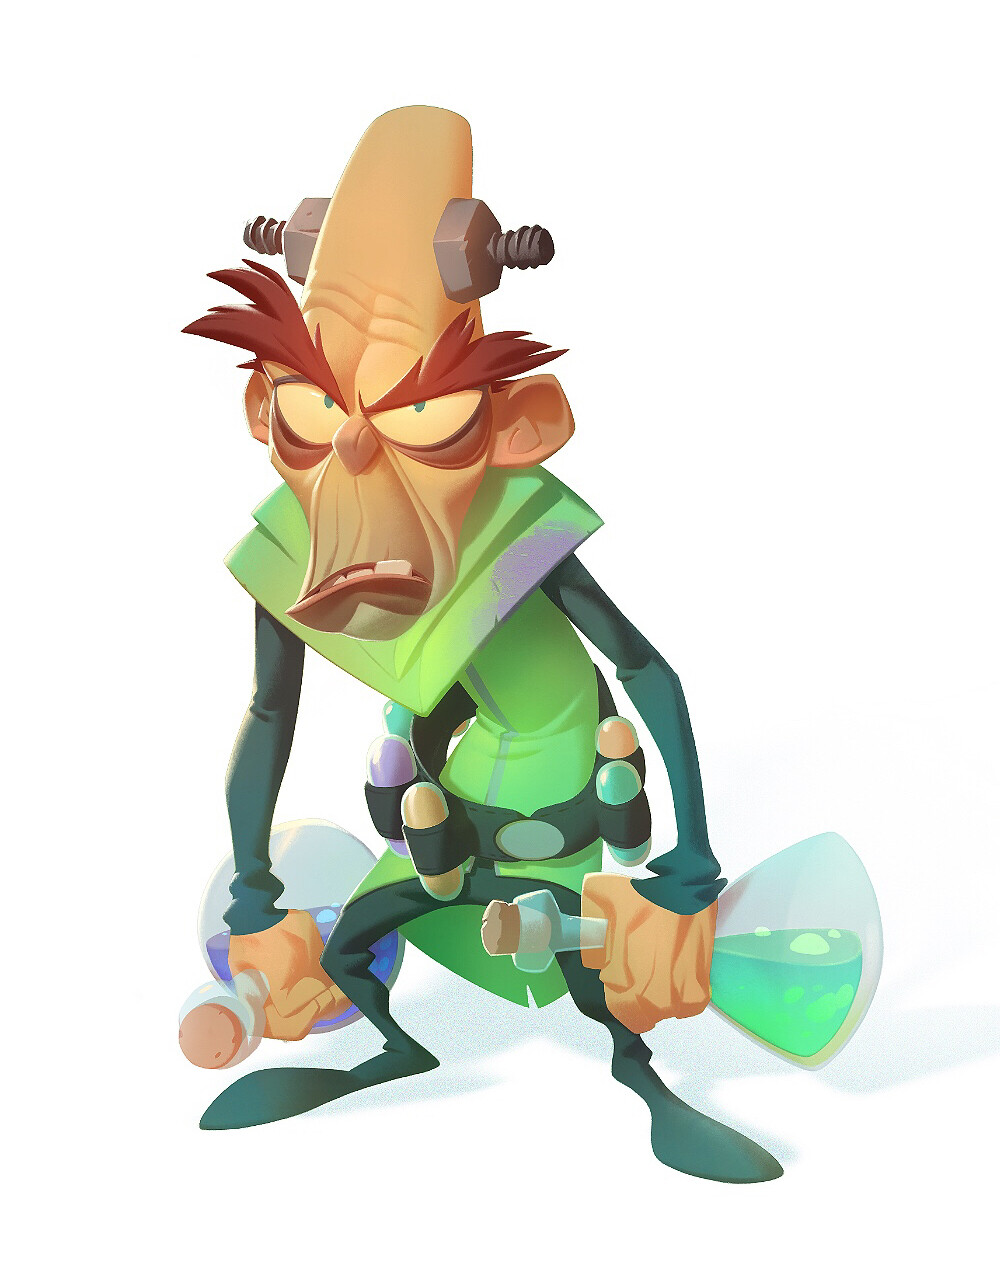 Artstation Crash Bandicoot 4 Villains First Look Nicholas Kole Crash Bandicoot Crash Bandicoot Characters Bandicoot